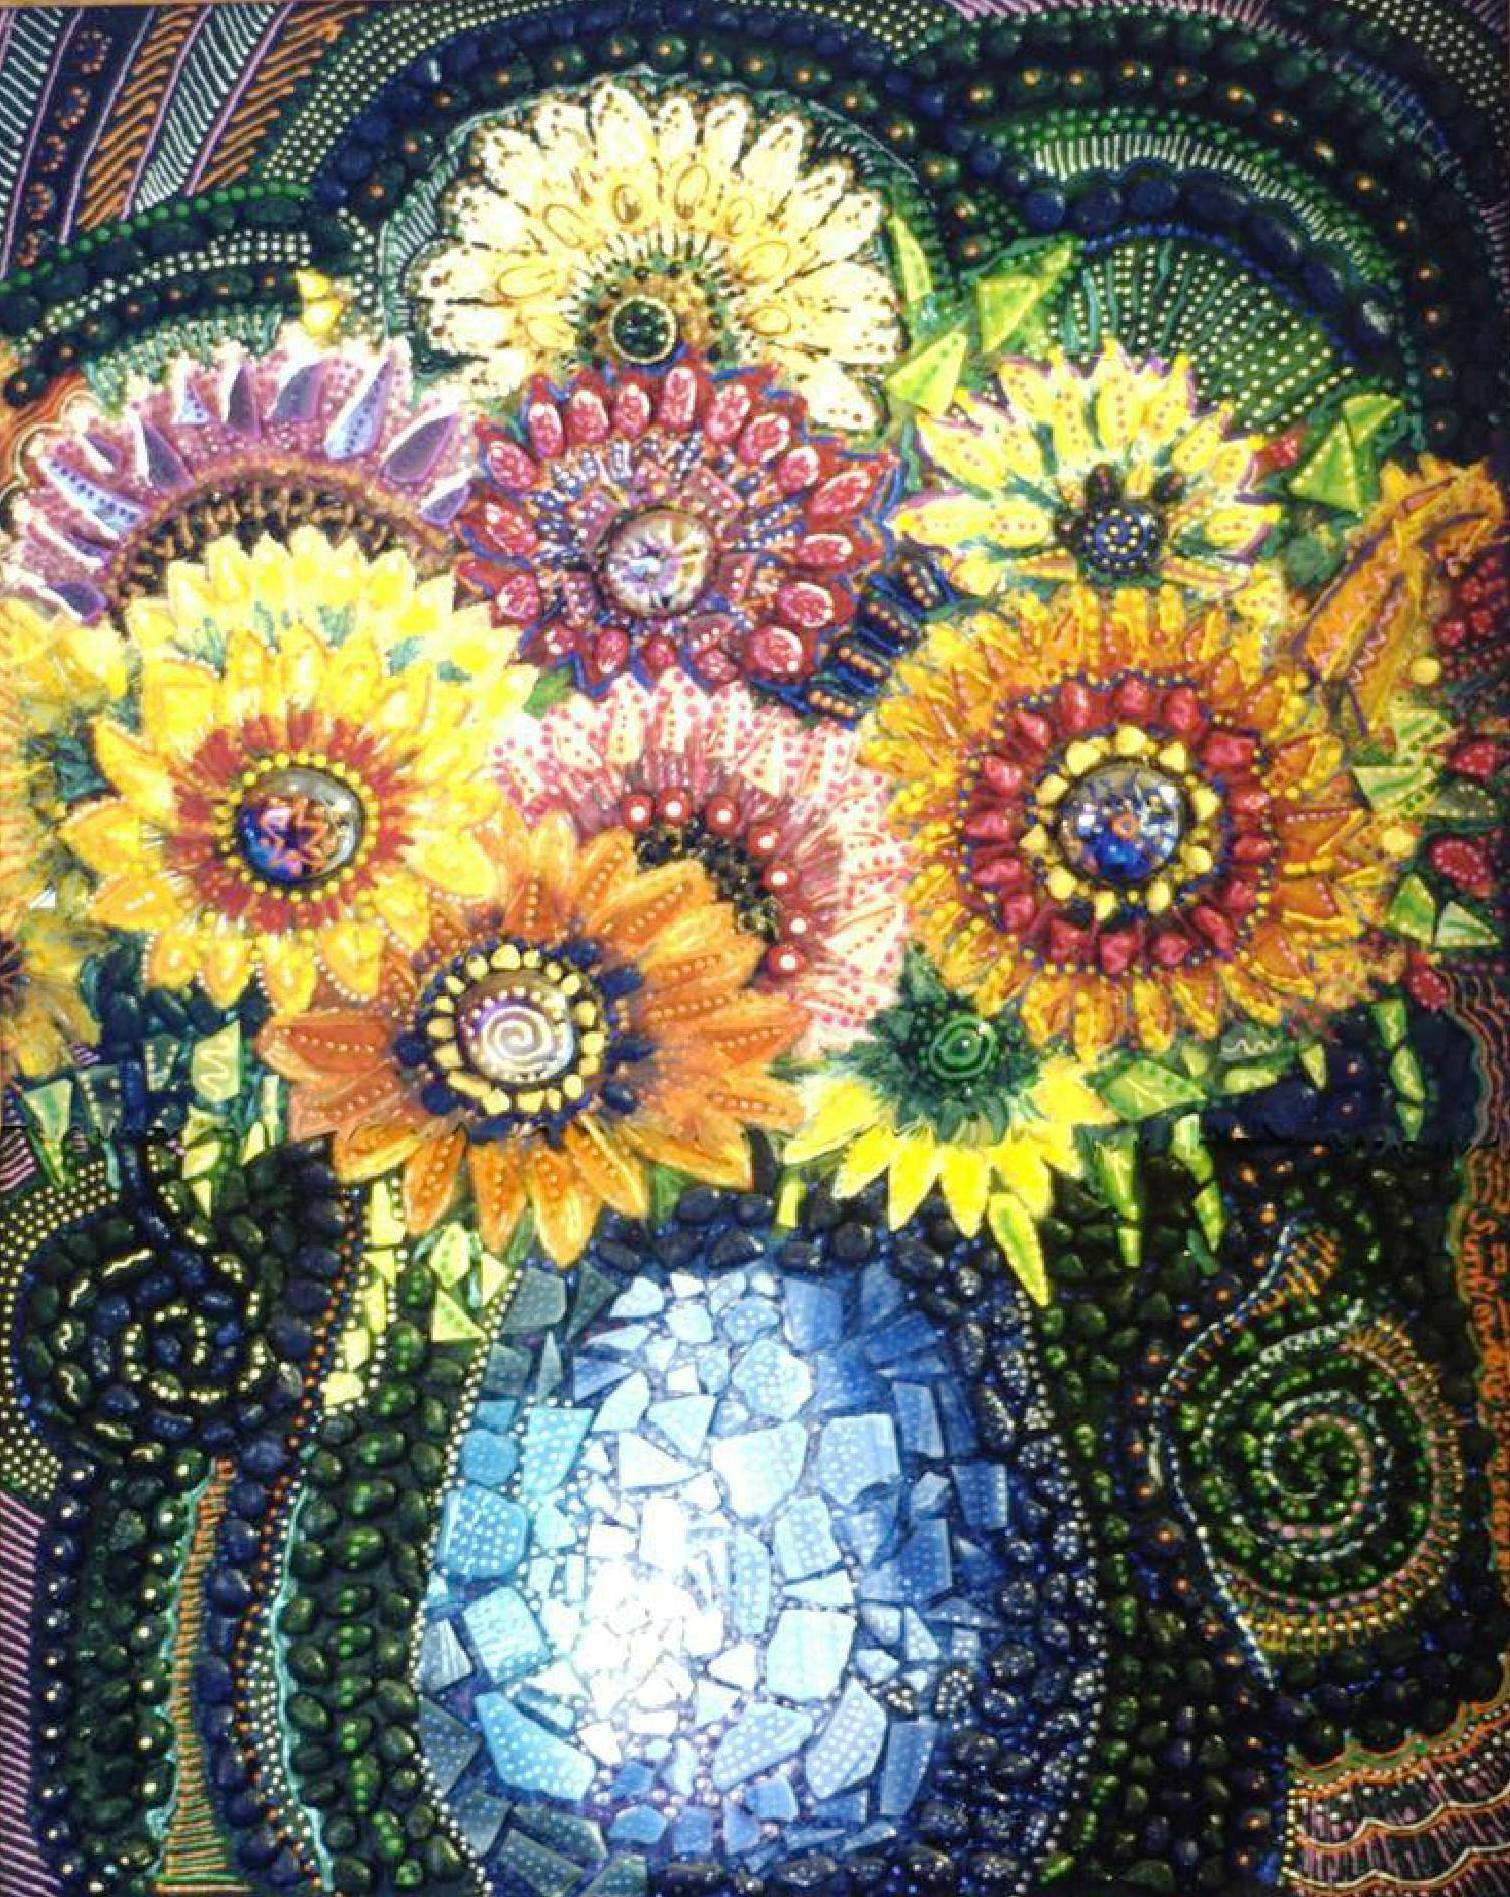 SOLD - Sunflower Mosiac